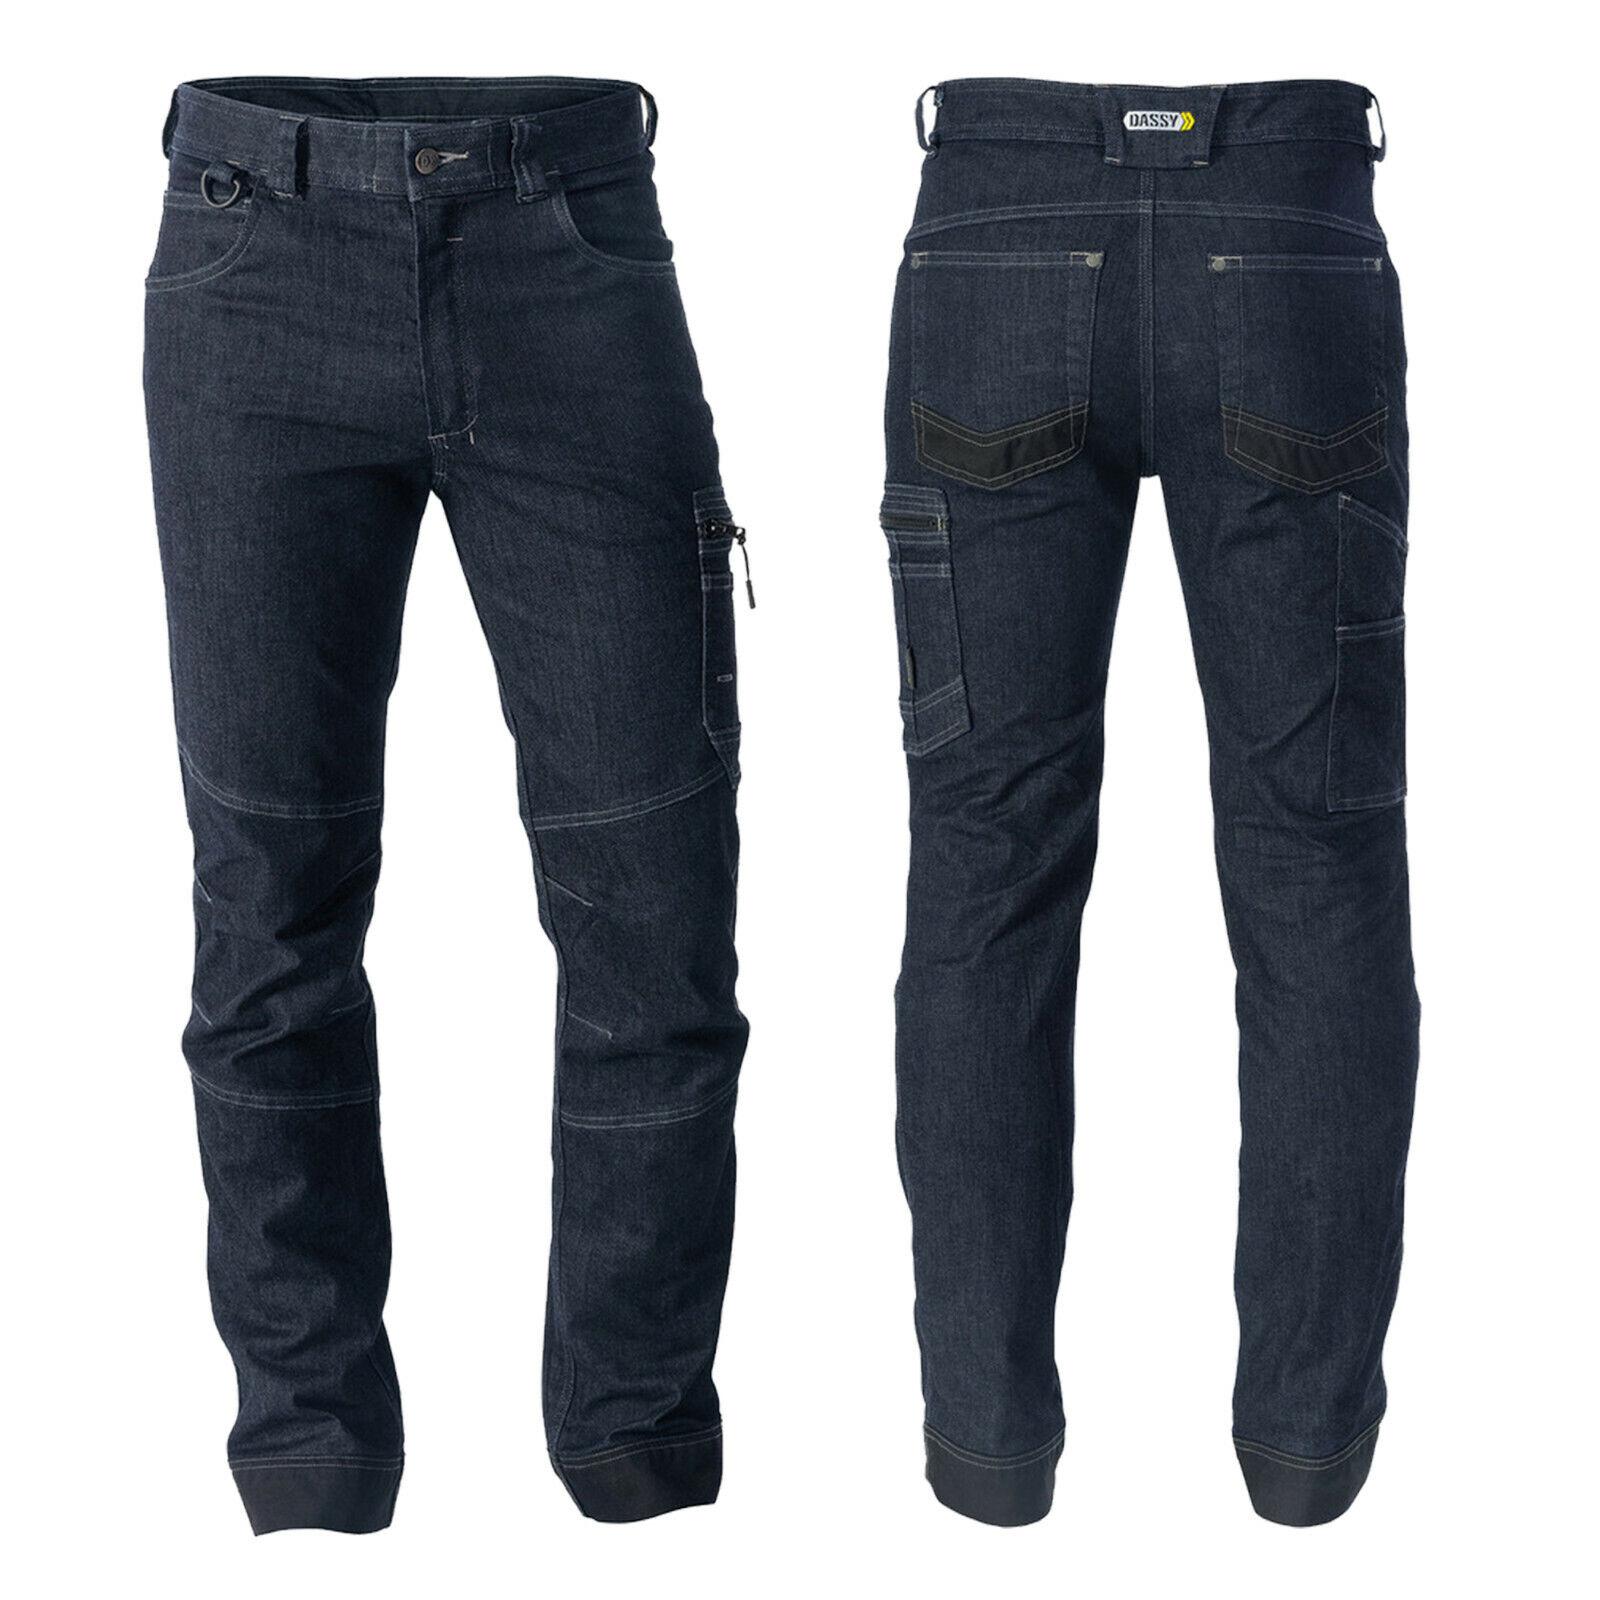 DASSY® Osaka Arbeitshose mit Stretch Herren Hose Workwear Herrenhose Jeanshose